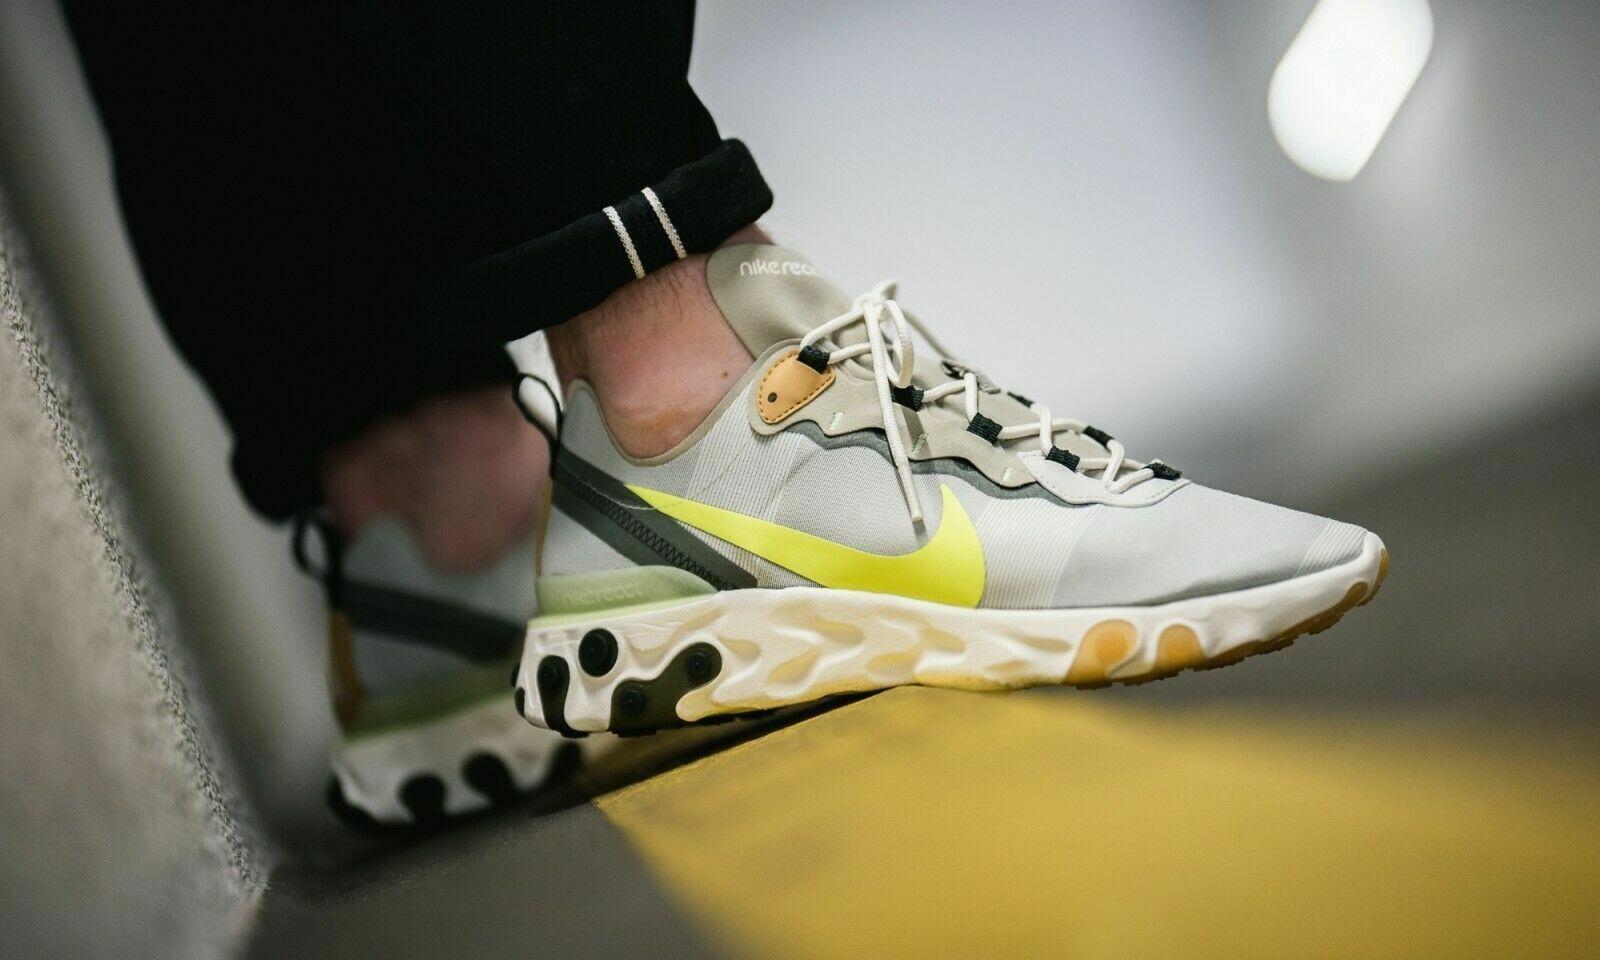 NIB Nike Reagisce Element 55  bianca grigio Volta Mens Scarpe scarpe da ginnastica Trainers Sz 15  negozio online